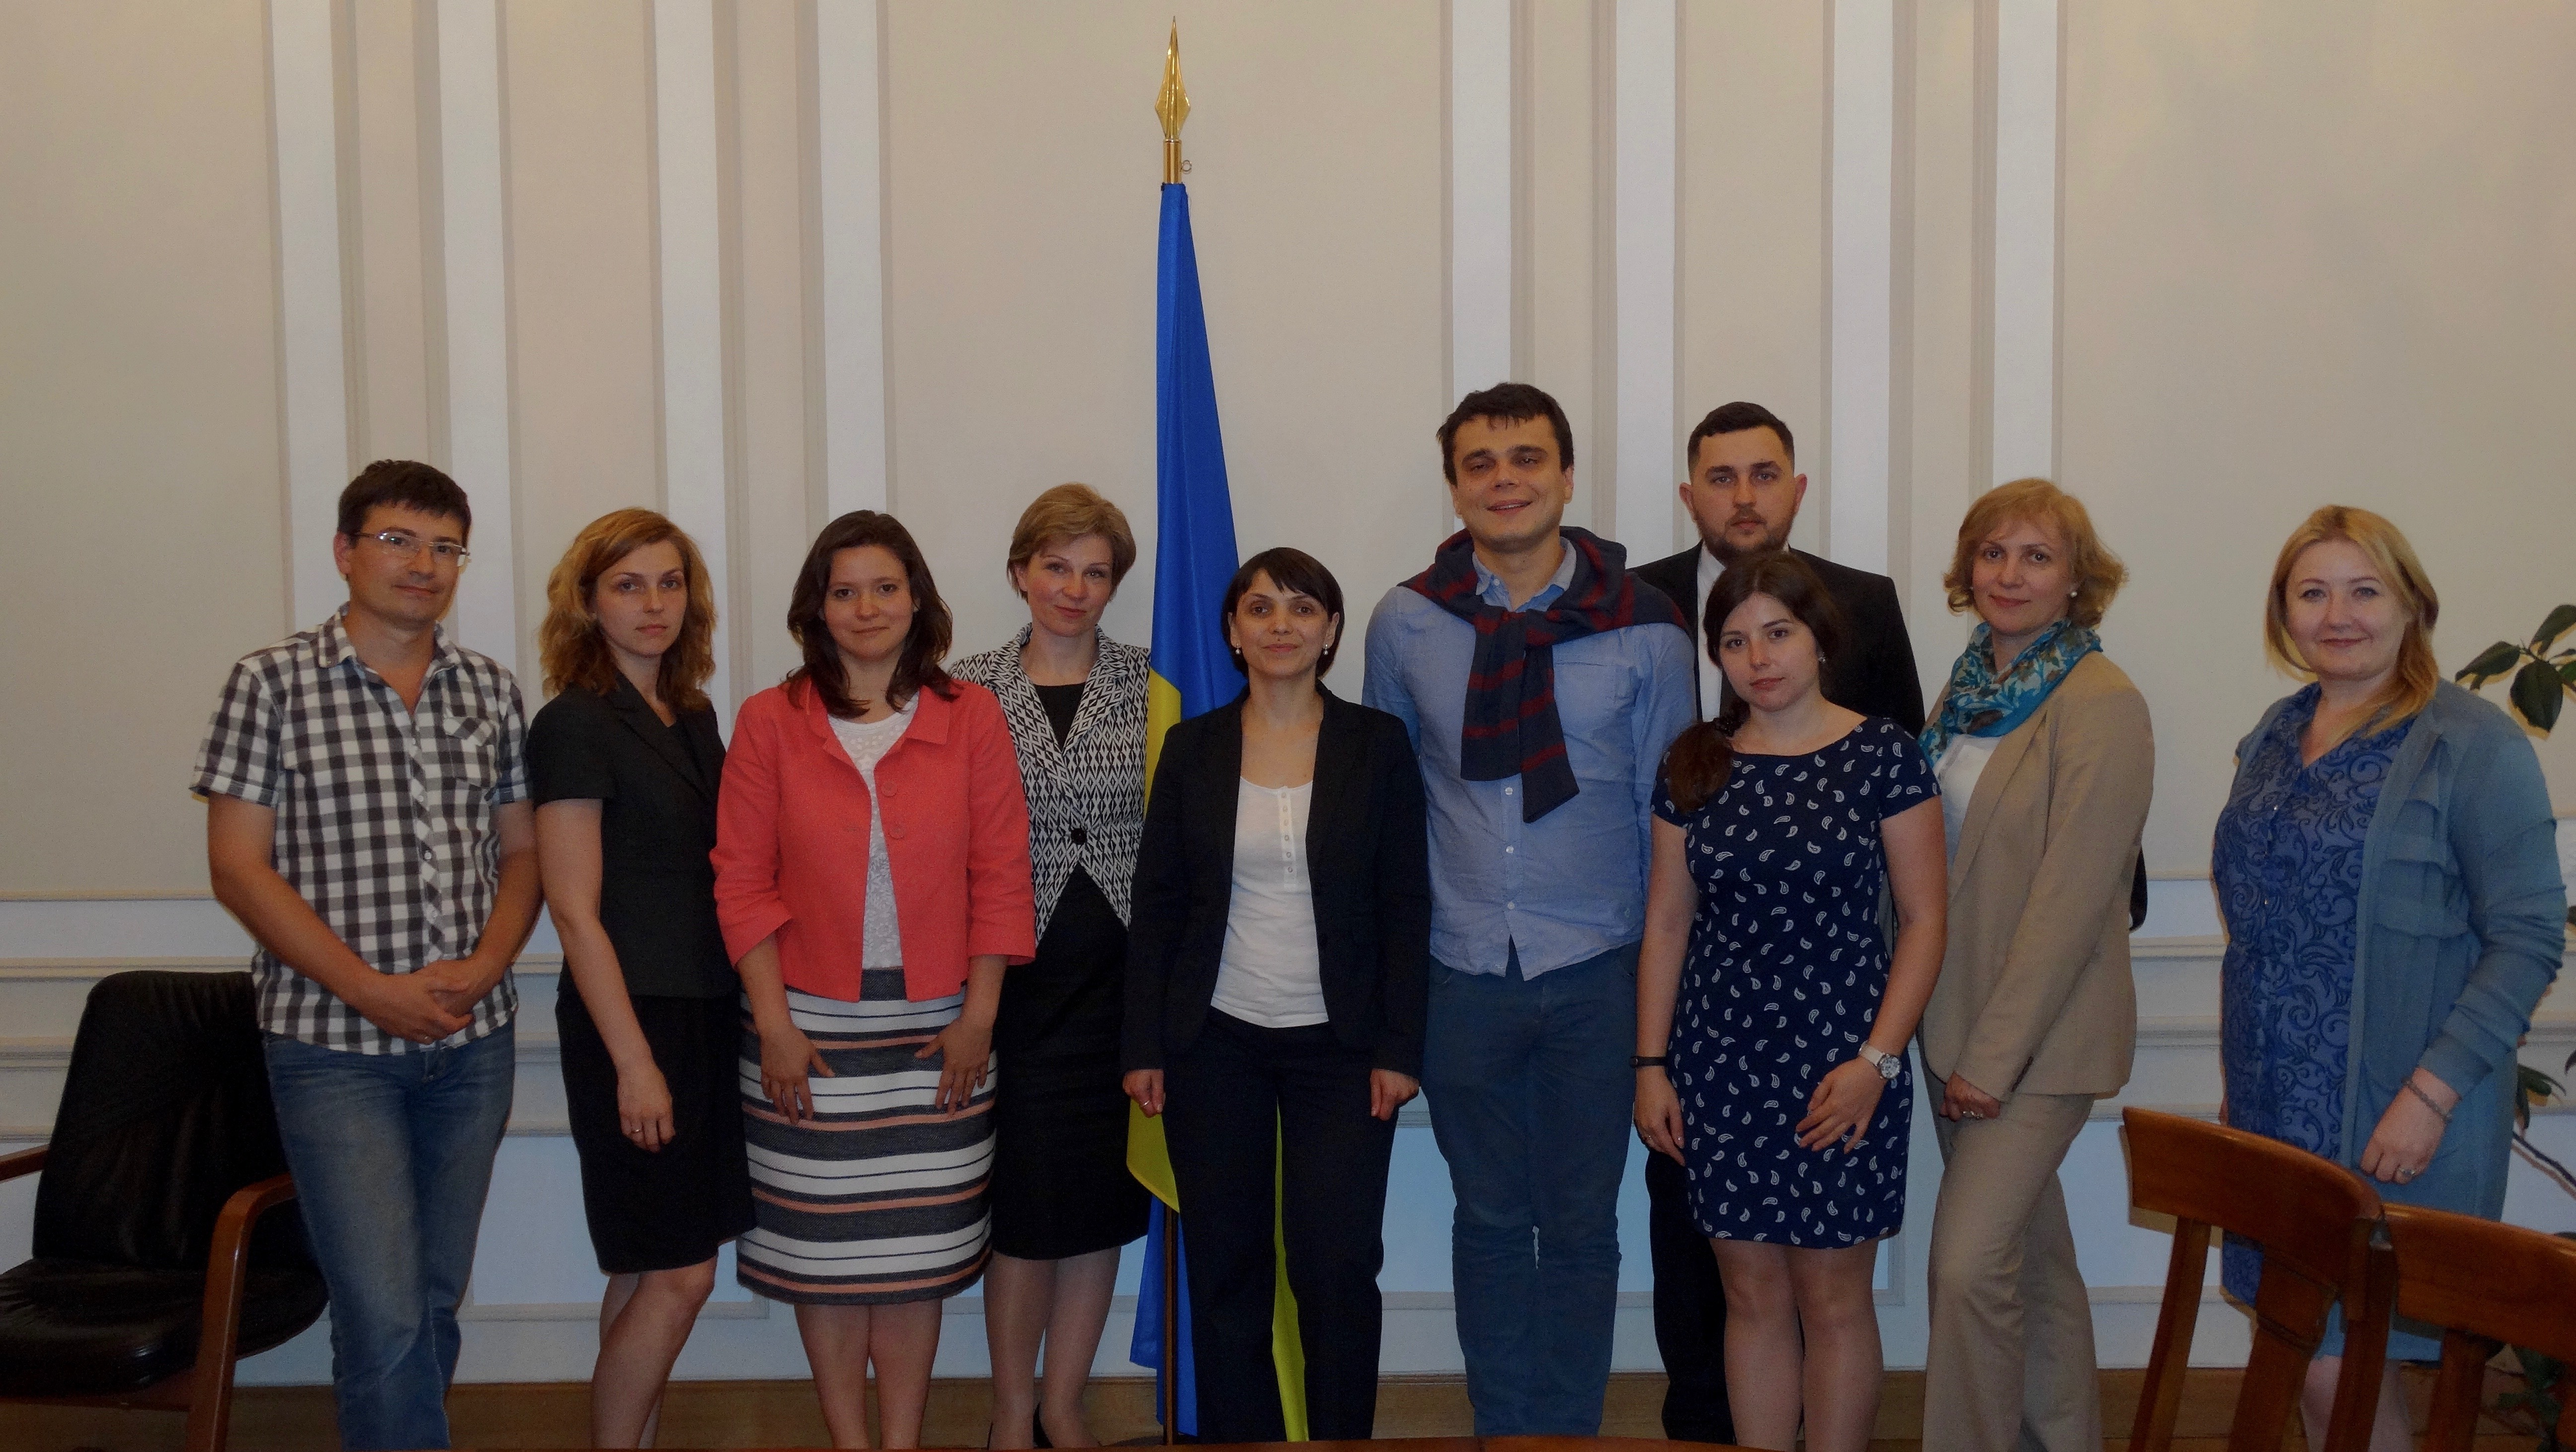 Mission of Ukraine